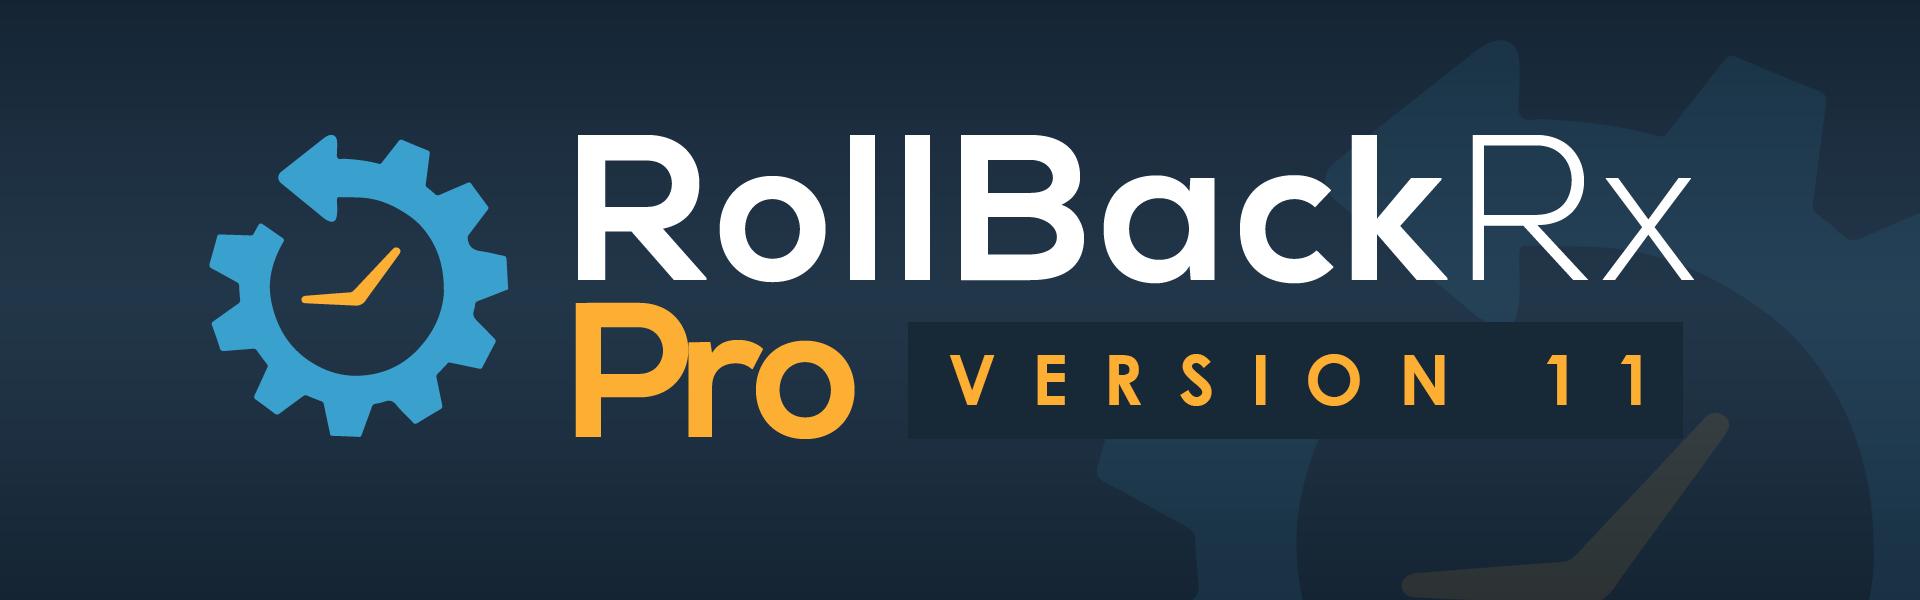 RollBack Rx Pro Version 11